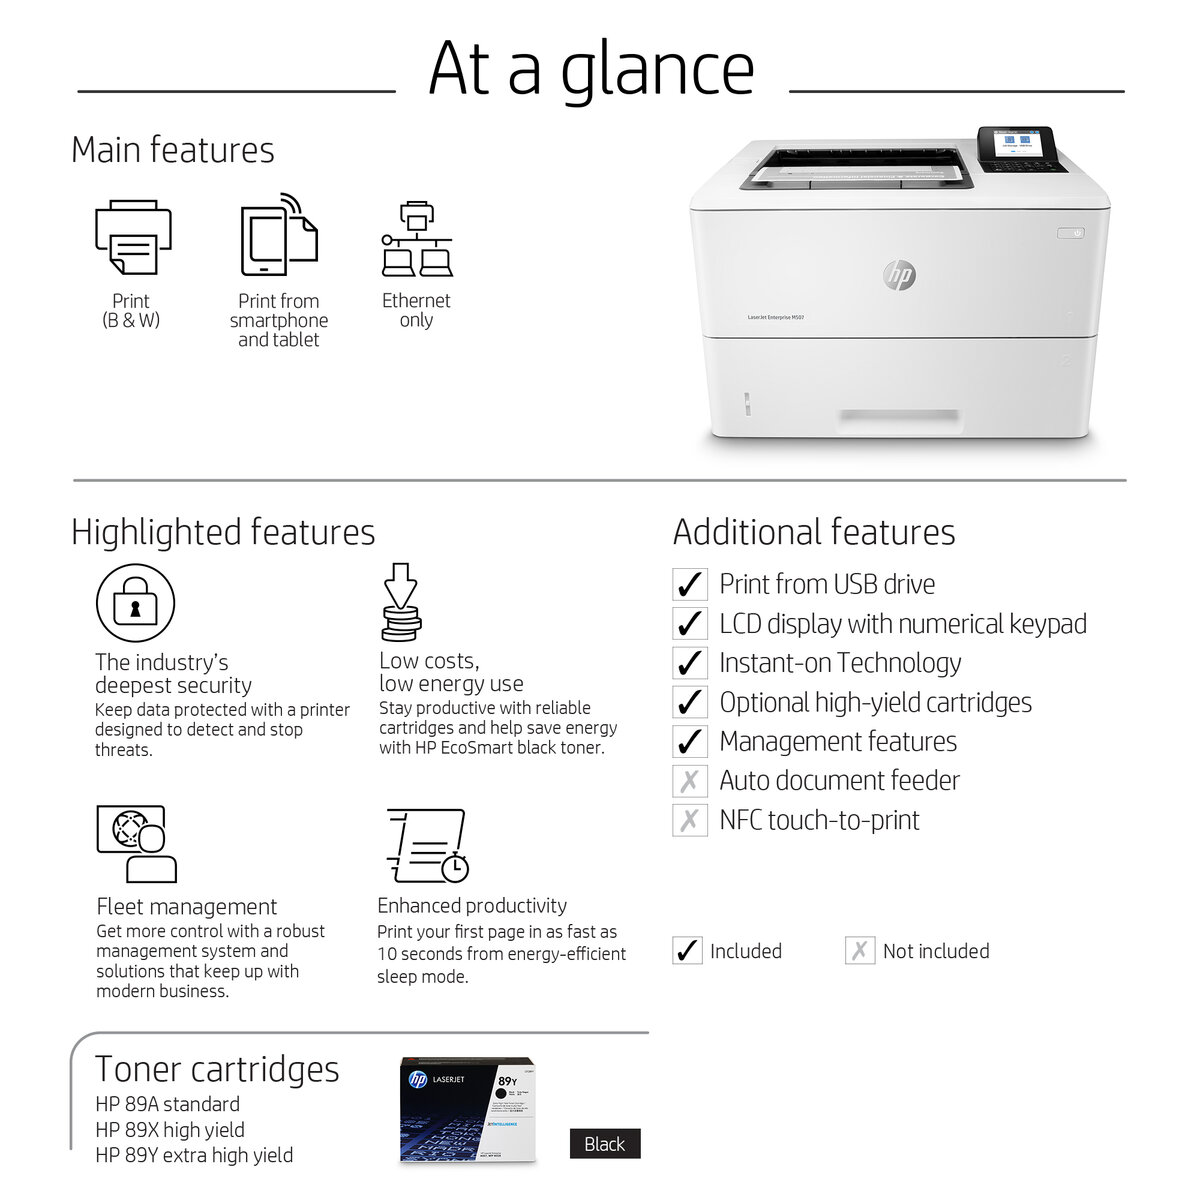 HP LaserJet Enterprise M507n Monochrome Laser Printer, 45 ppm Black,  1200x1200 dpi, 650-Sheet Standard Input Tray (Manual Duplex Printing)